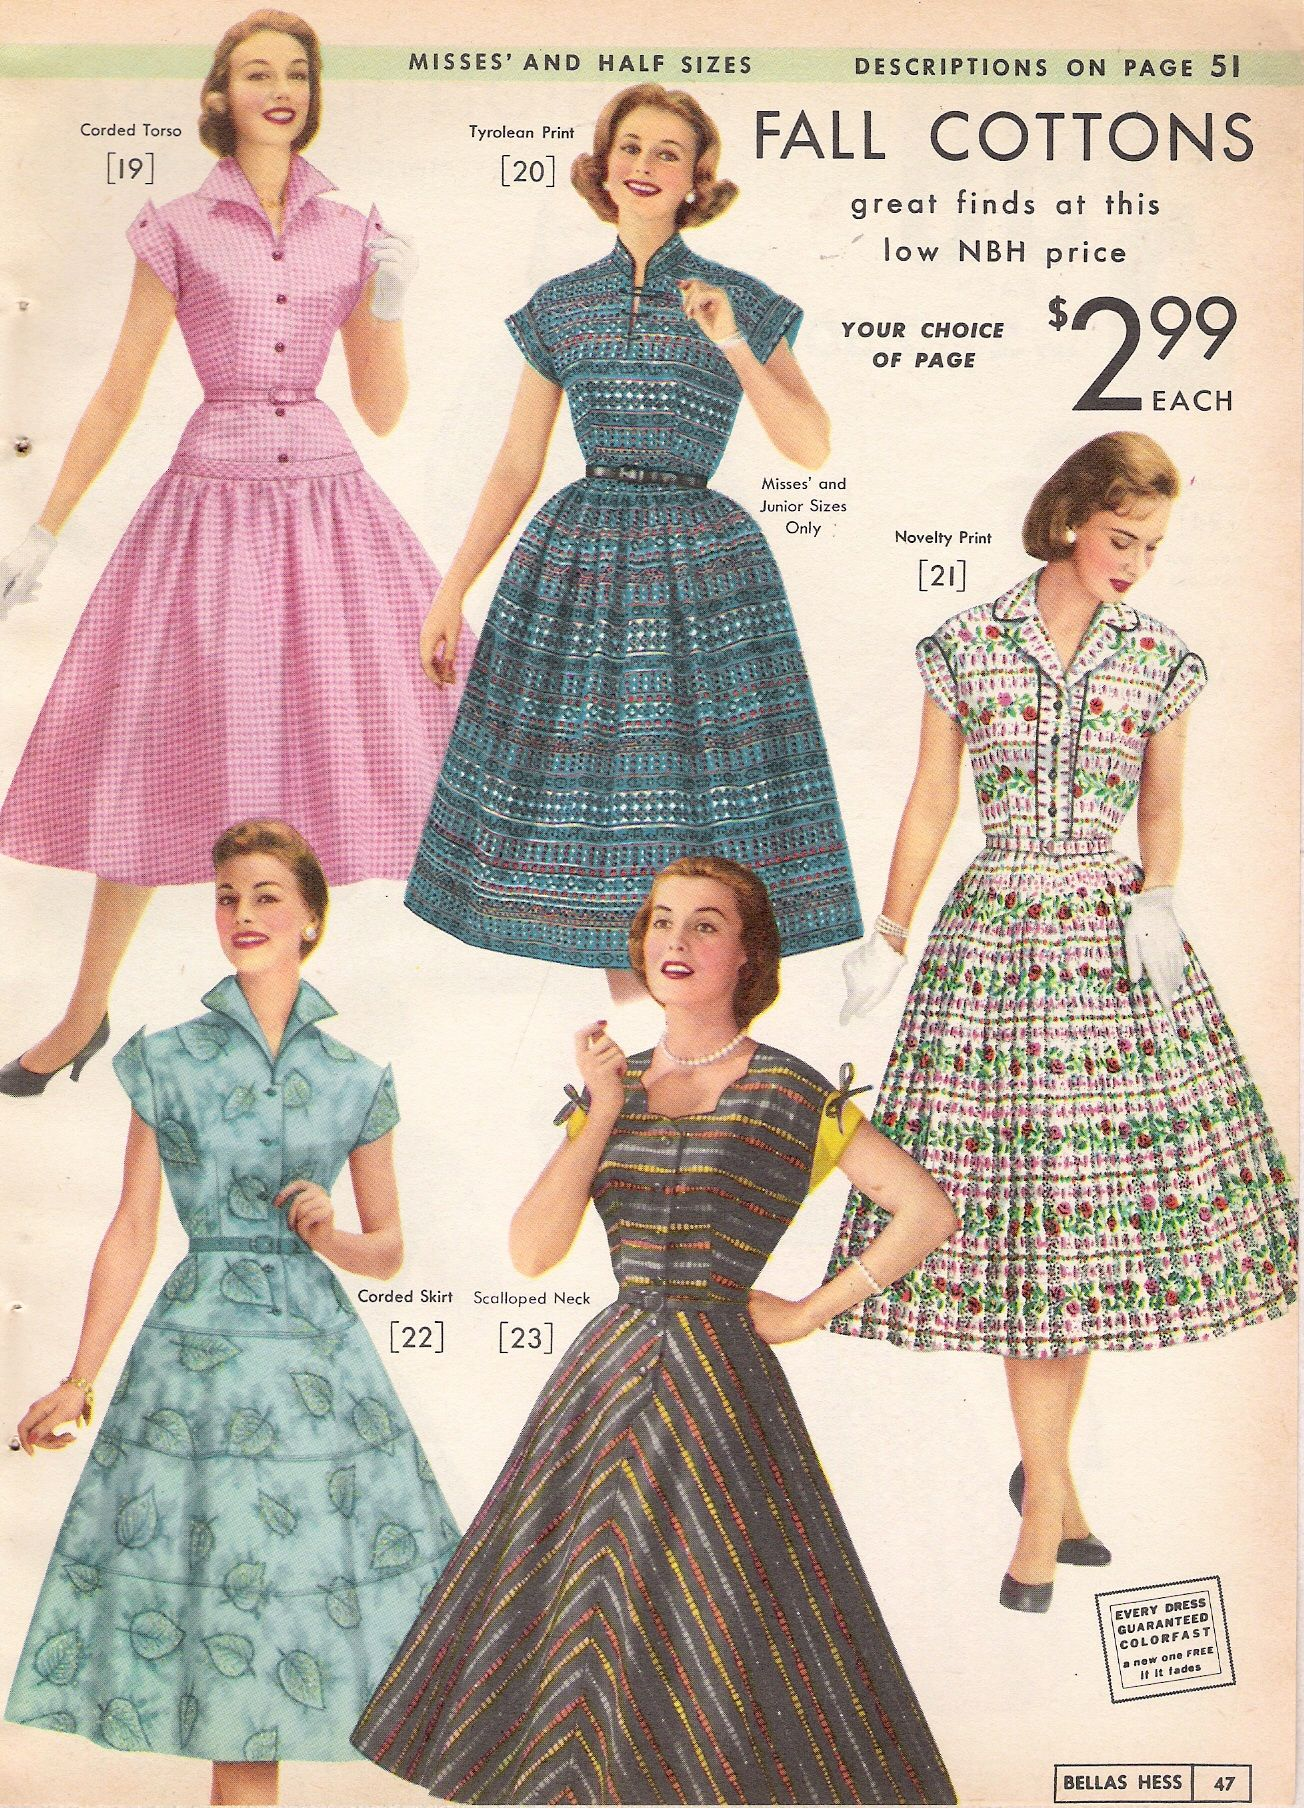 1950s House Dresses History 50s Shirtwaist Dress Vintage Fashion 1950s Dress History 1950s Fashion